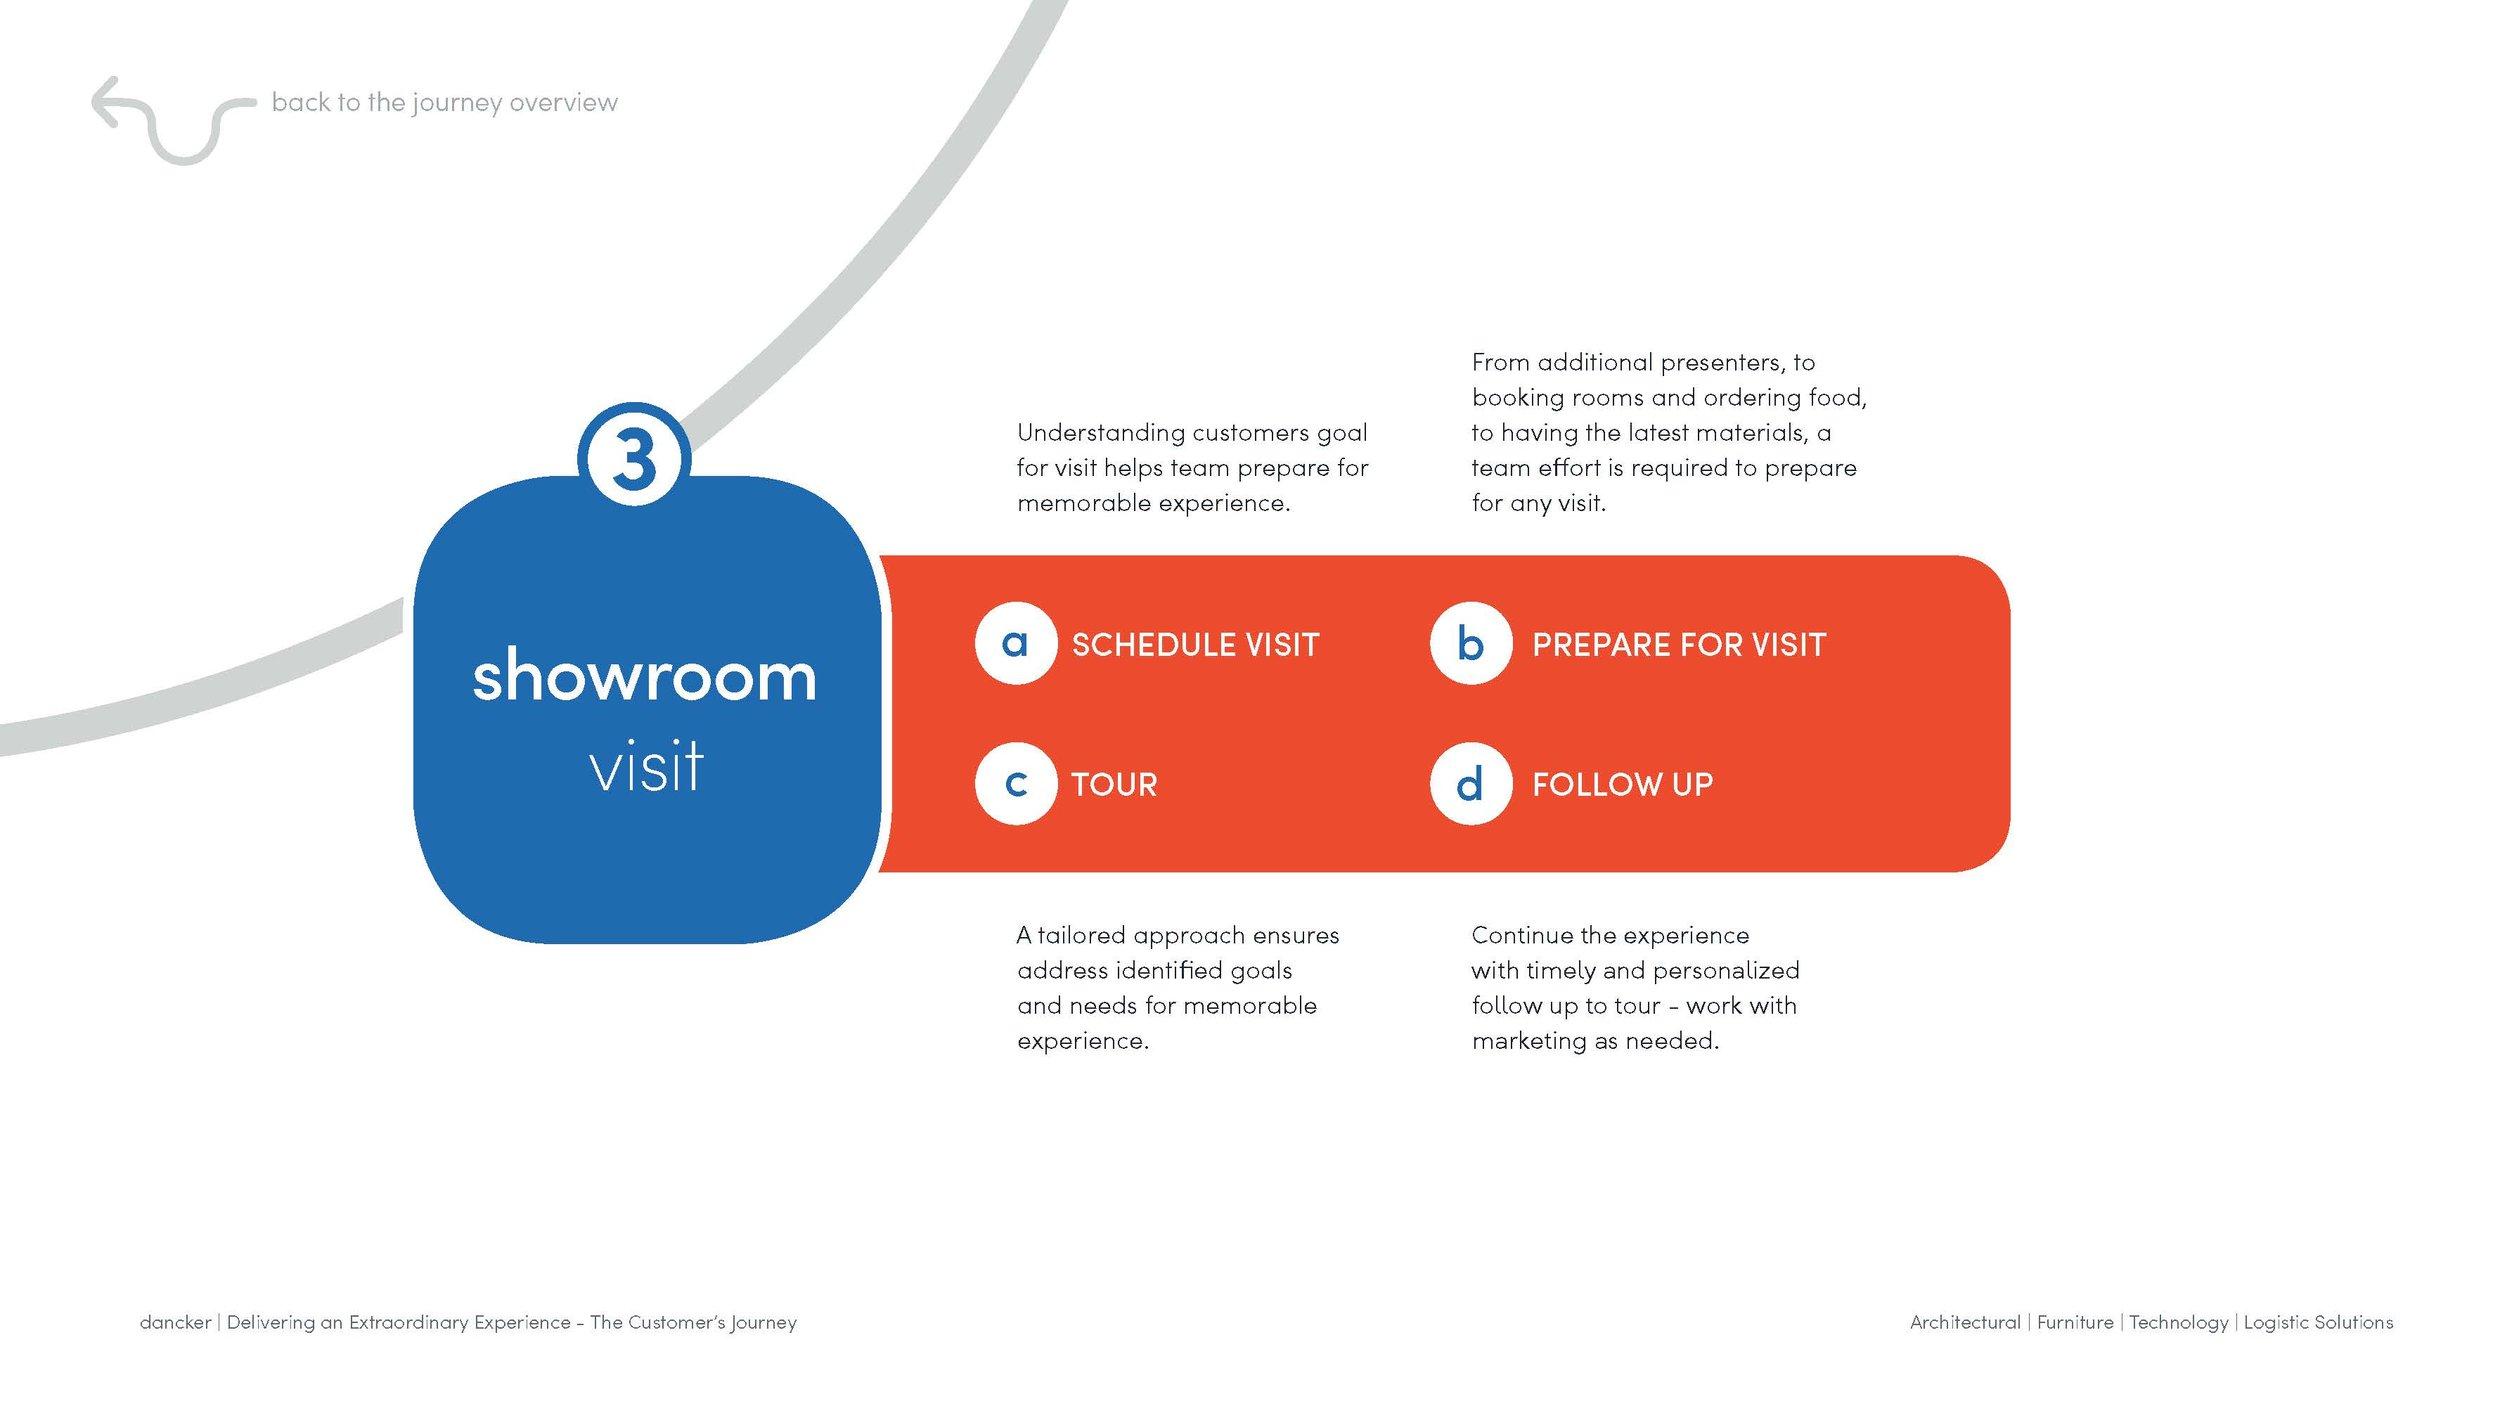 dancker_Customer Journey_Interactive Process_draft 3_Page_13.jpg